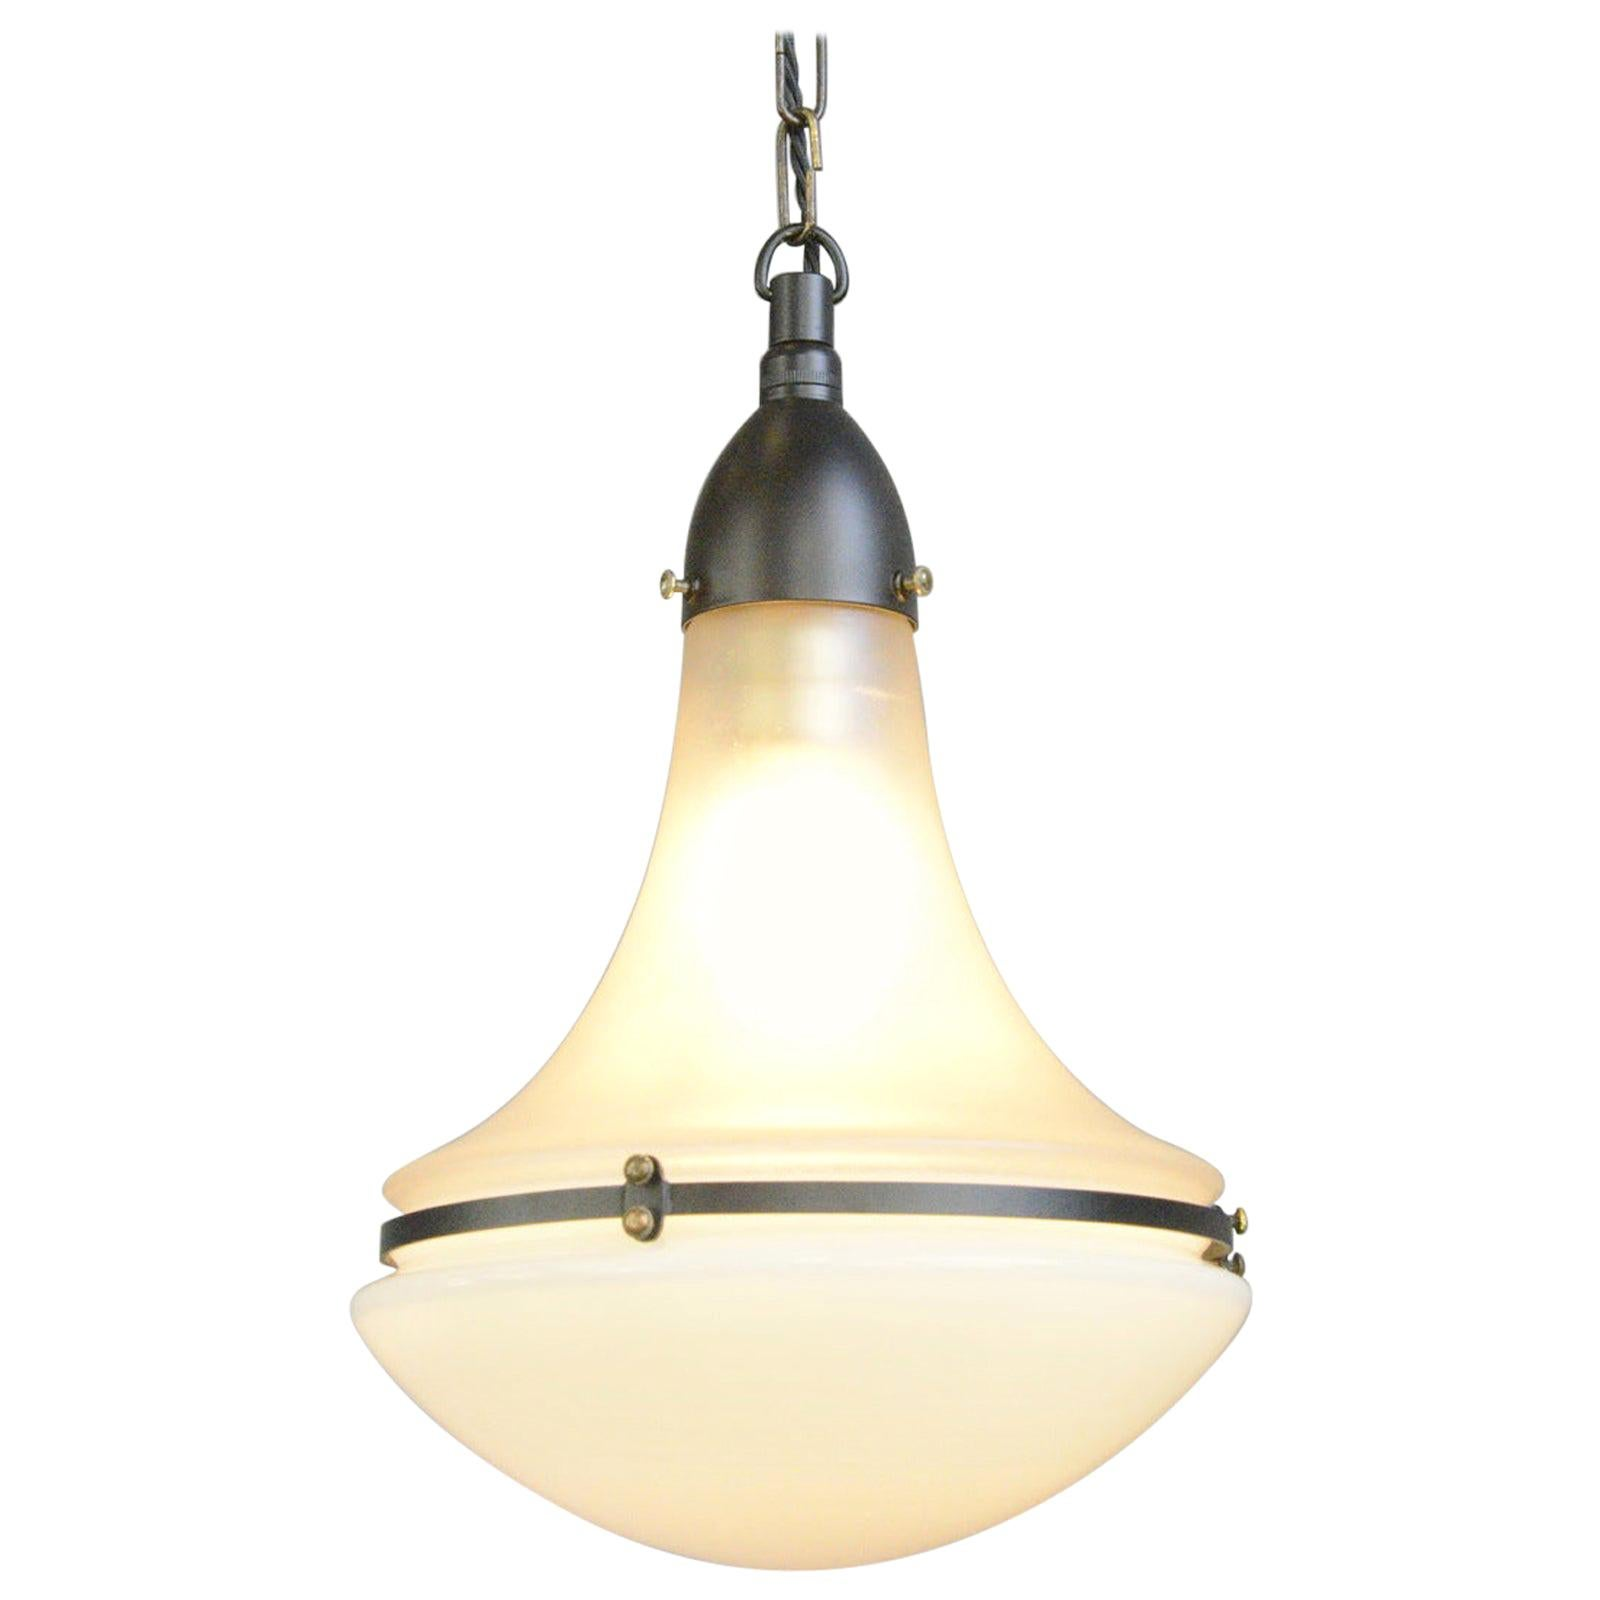 Luzette Pendant Light by Peter Behrens for Siemens, circa 1920s